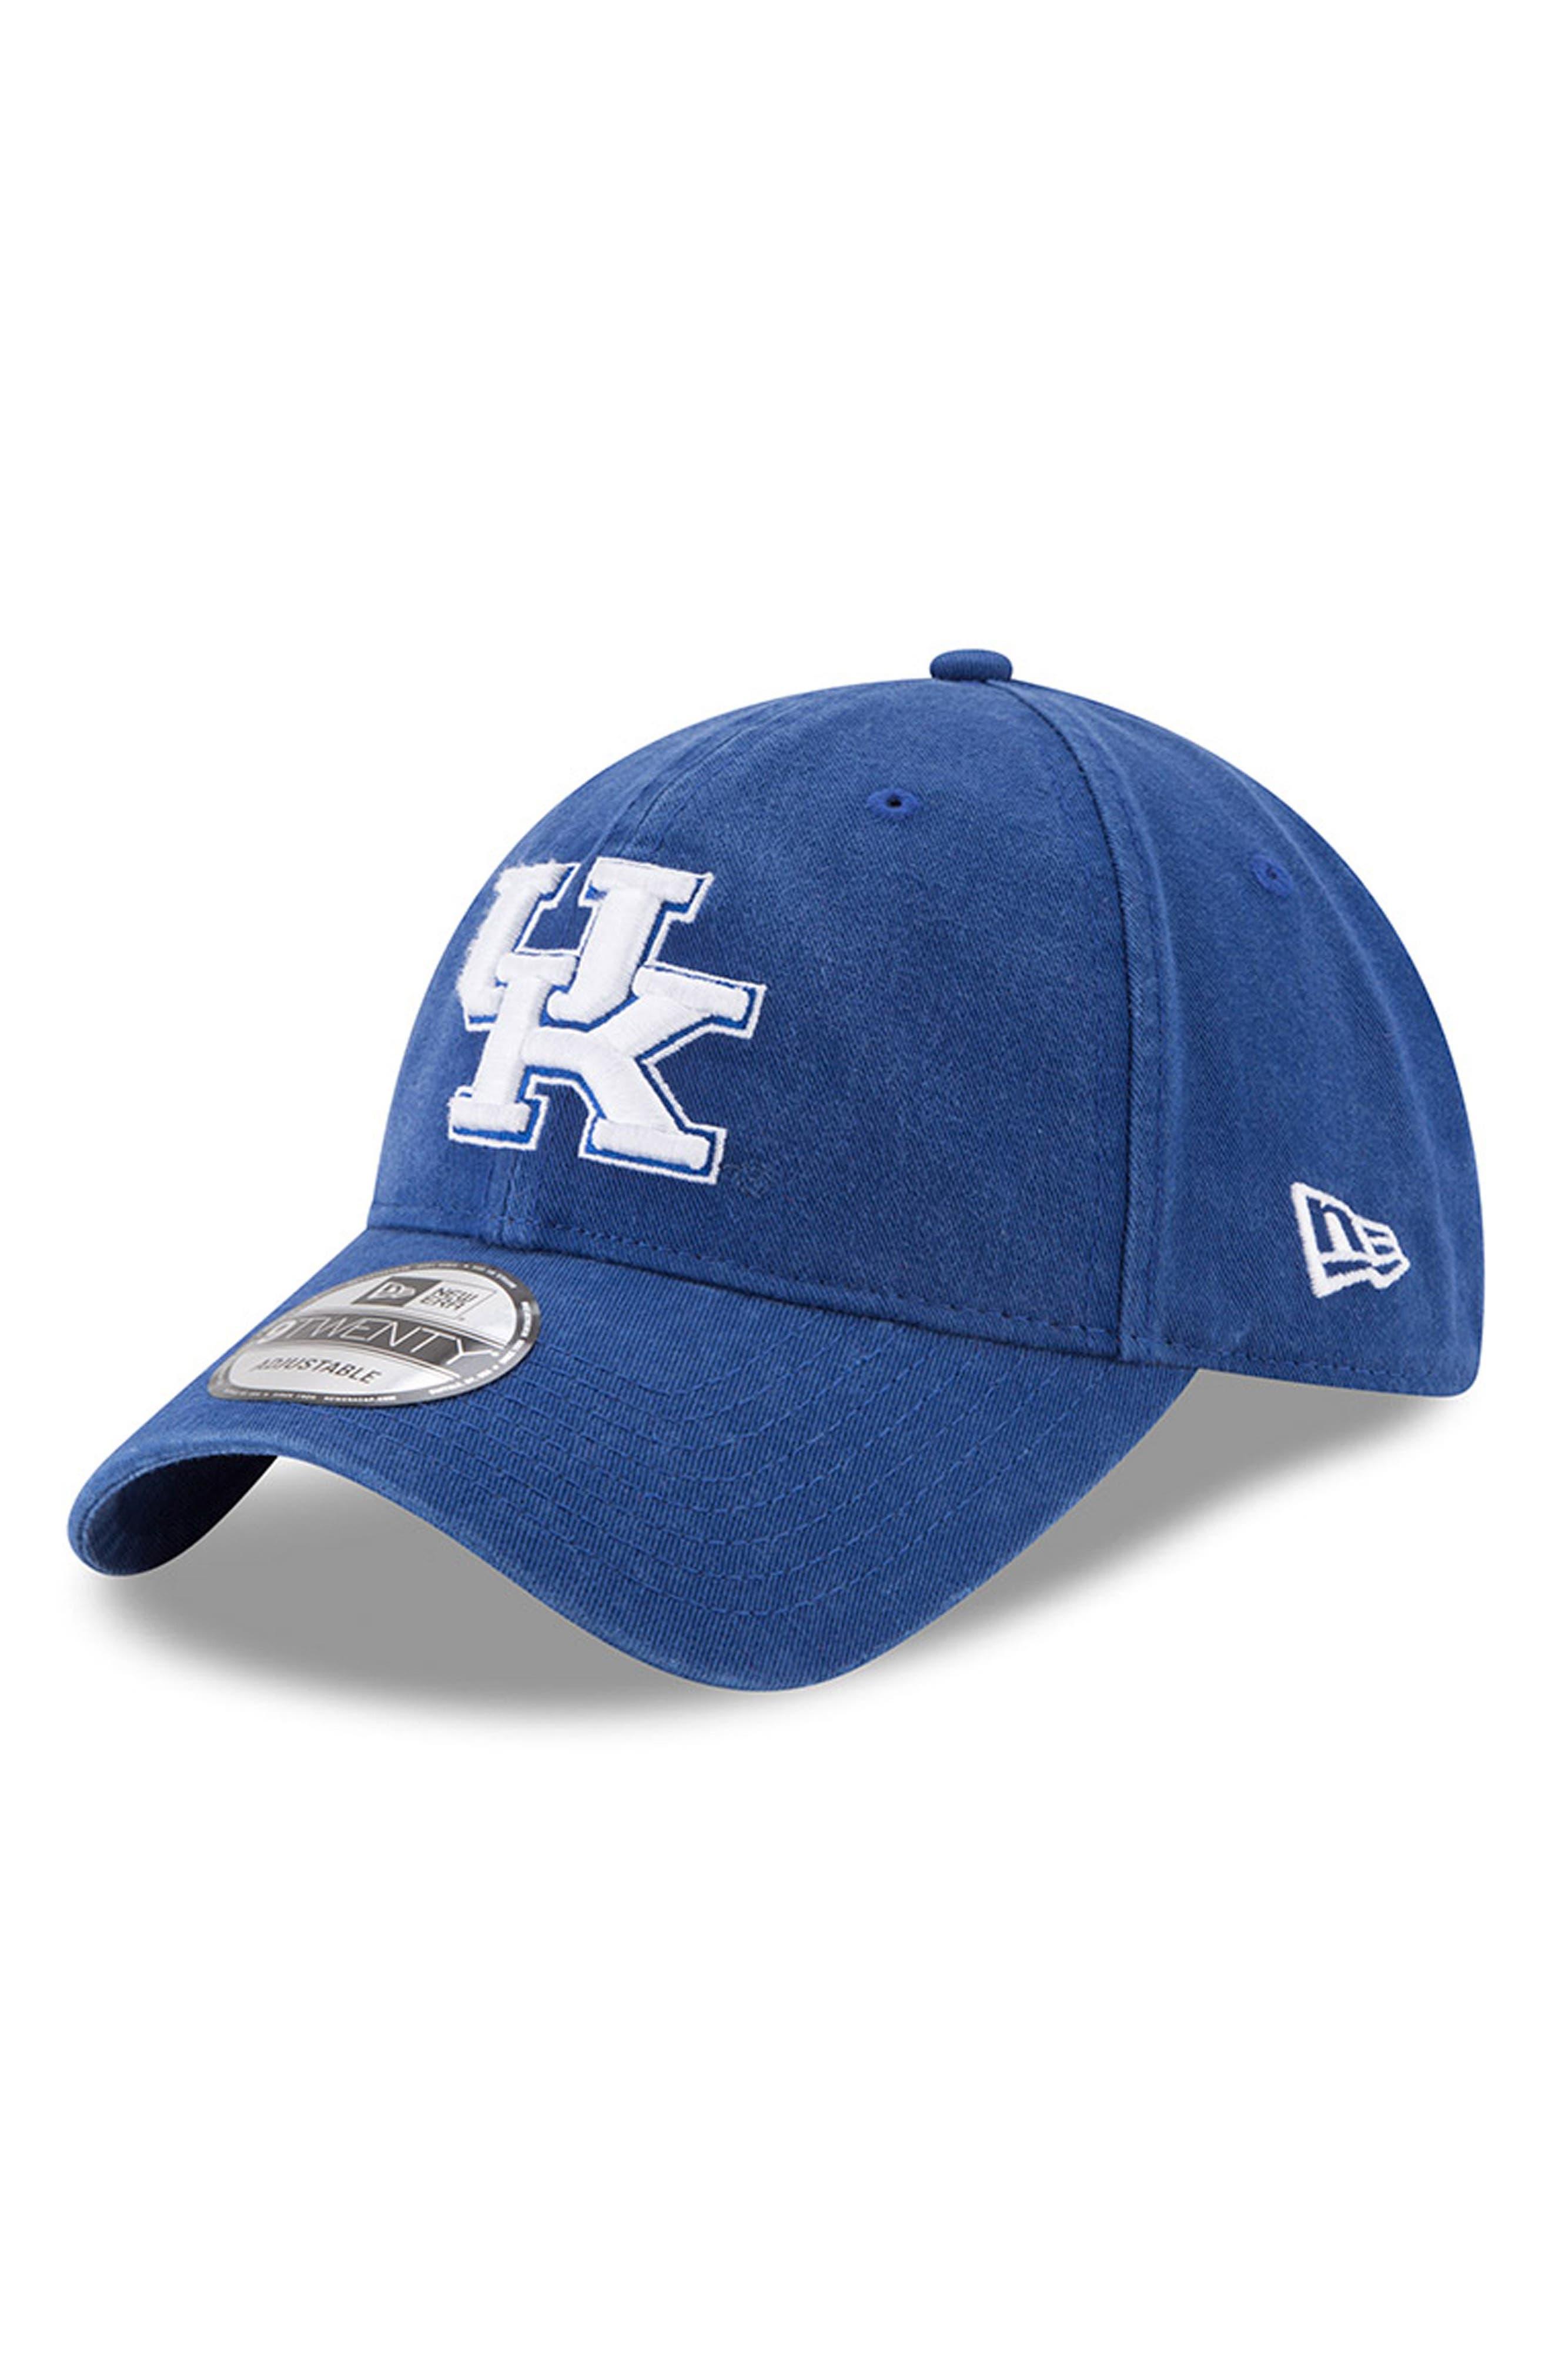 Main Image - New Era Collegiate Core Classic - Kentucky Wildcats Baseball Cap